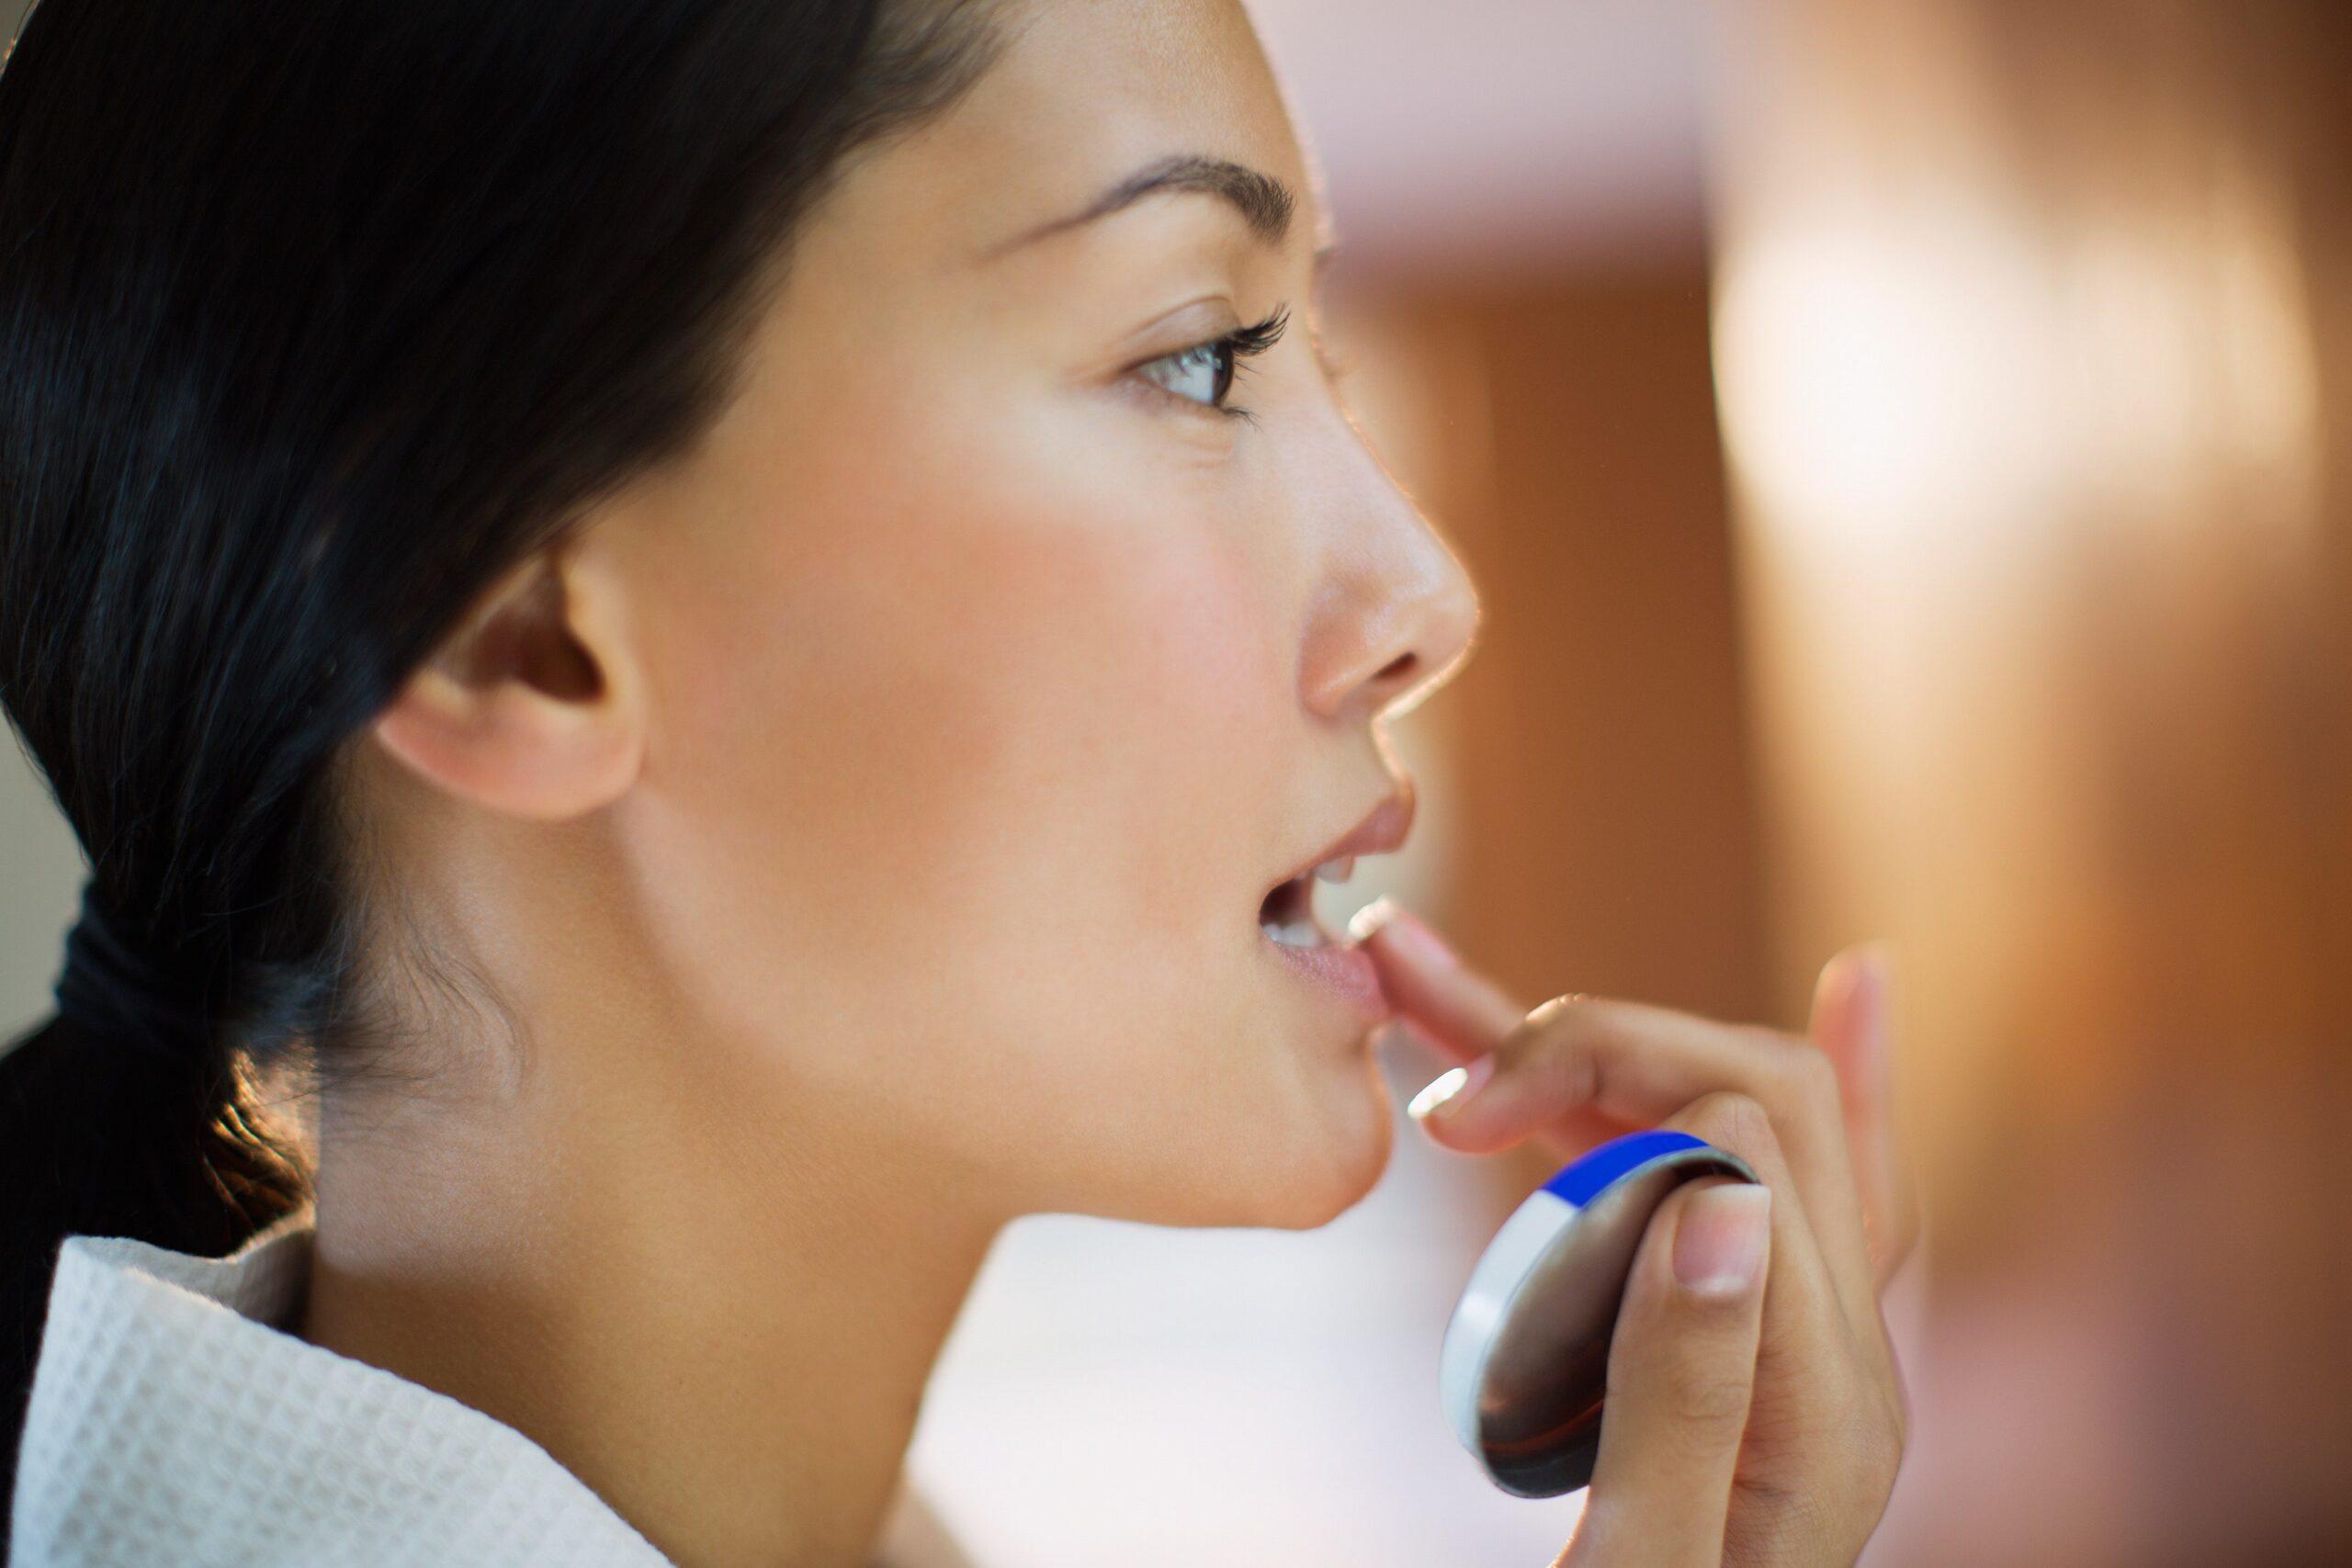 Applying the antifungal cream for lips